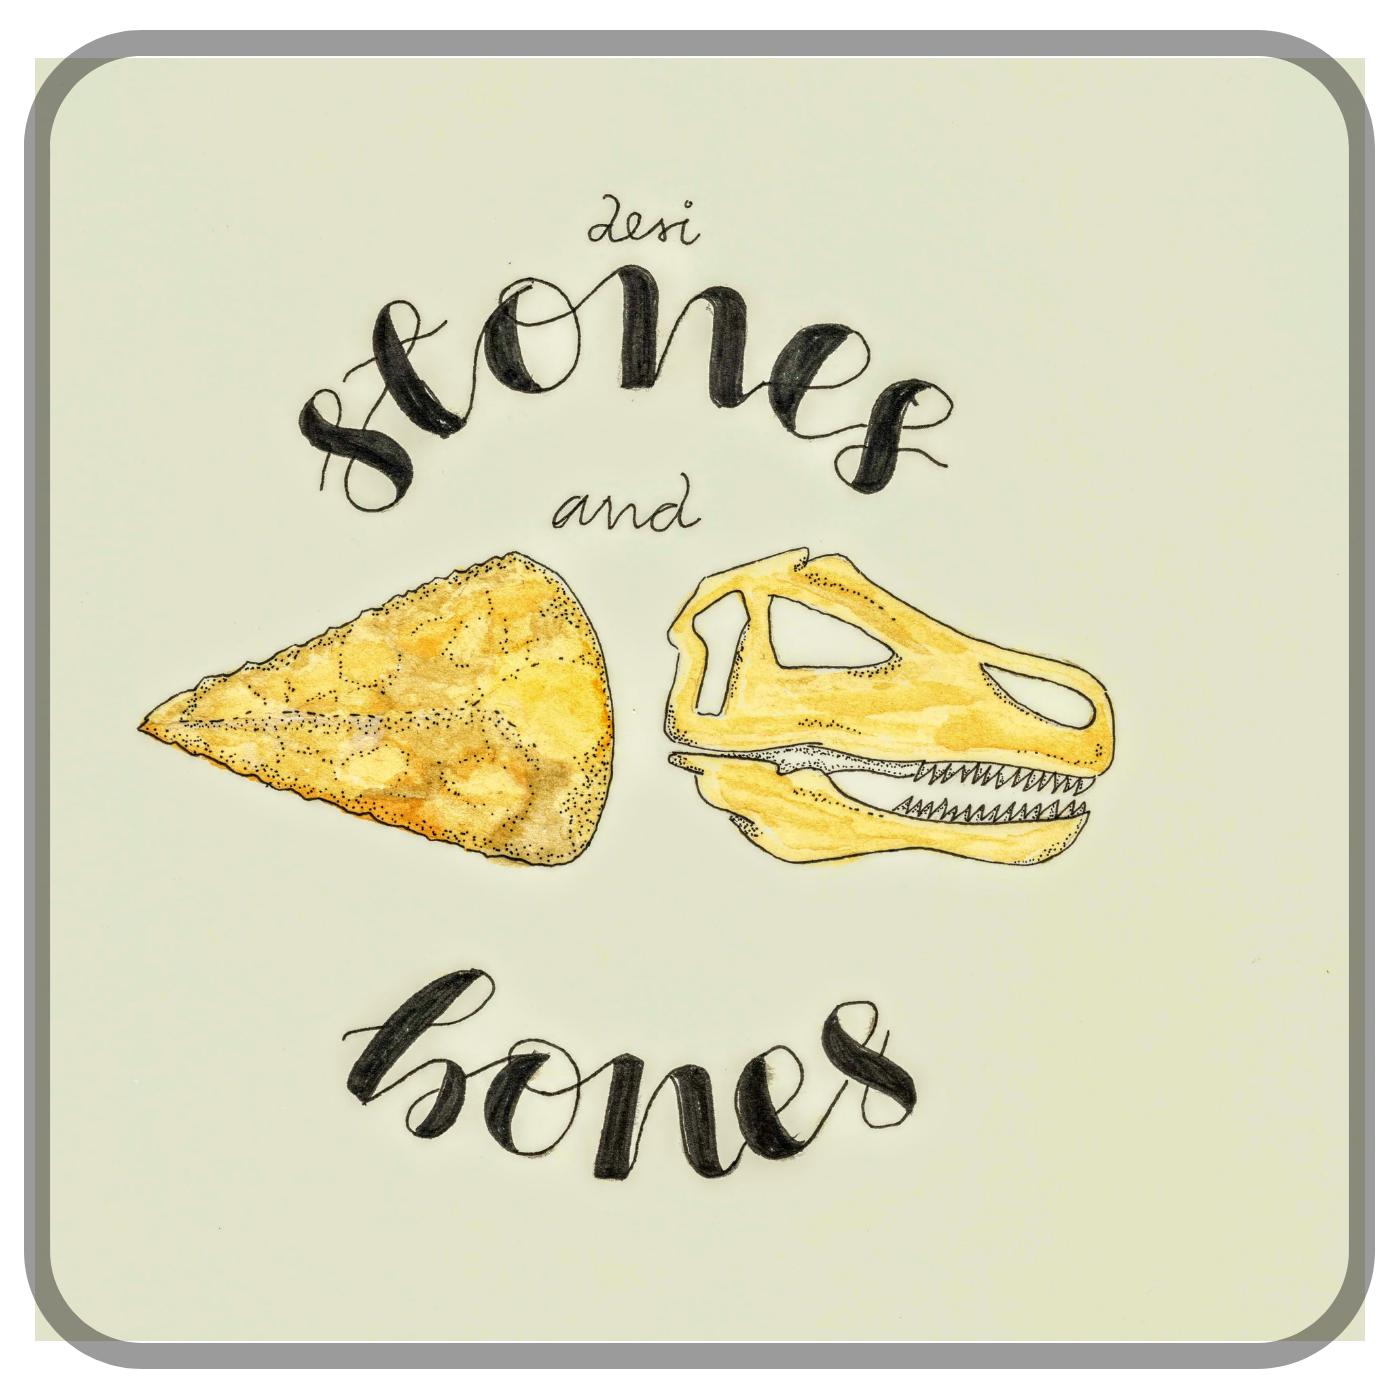 Desi Stones and Bones